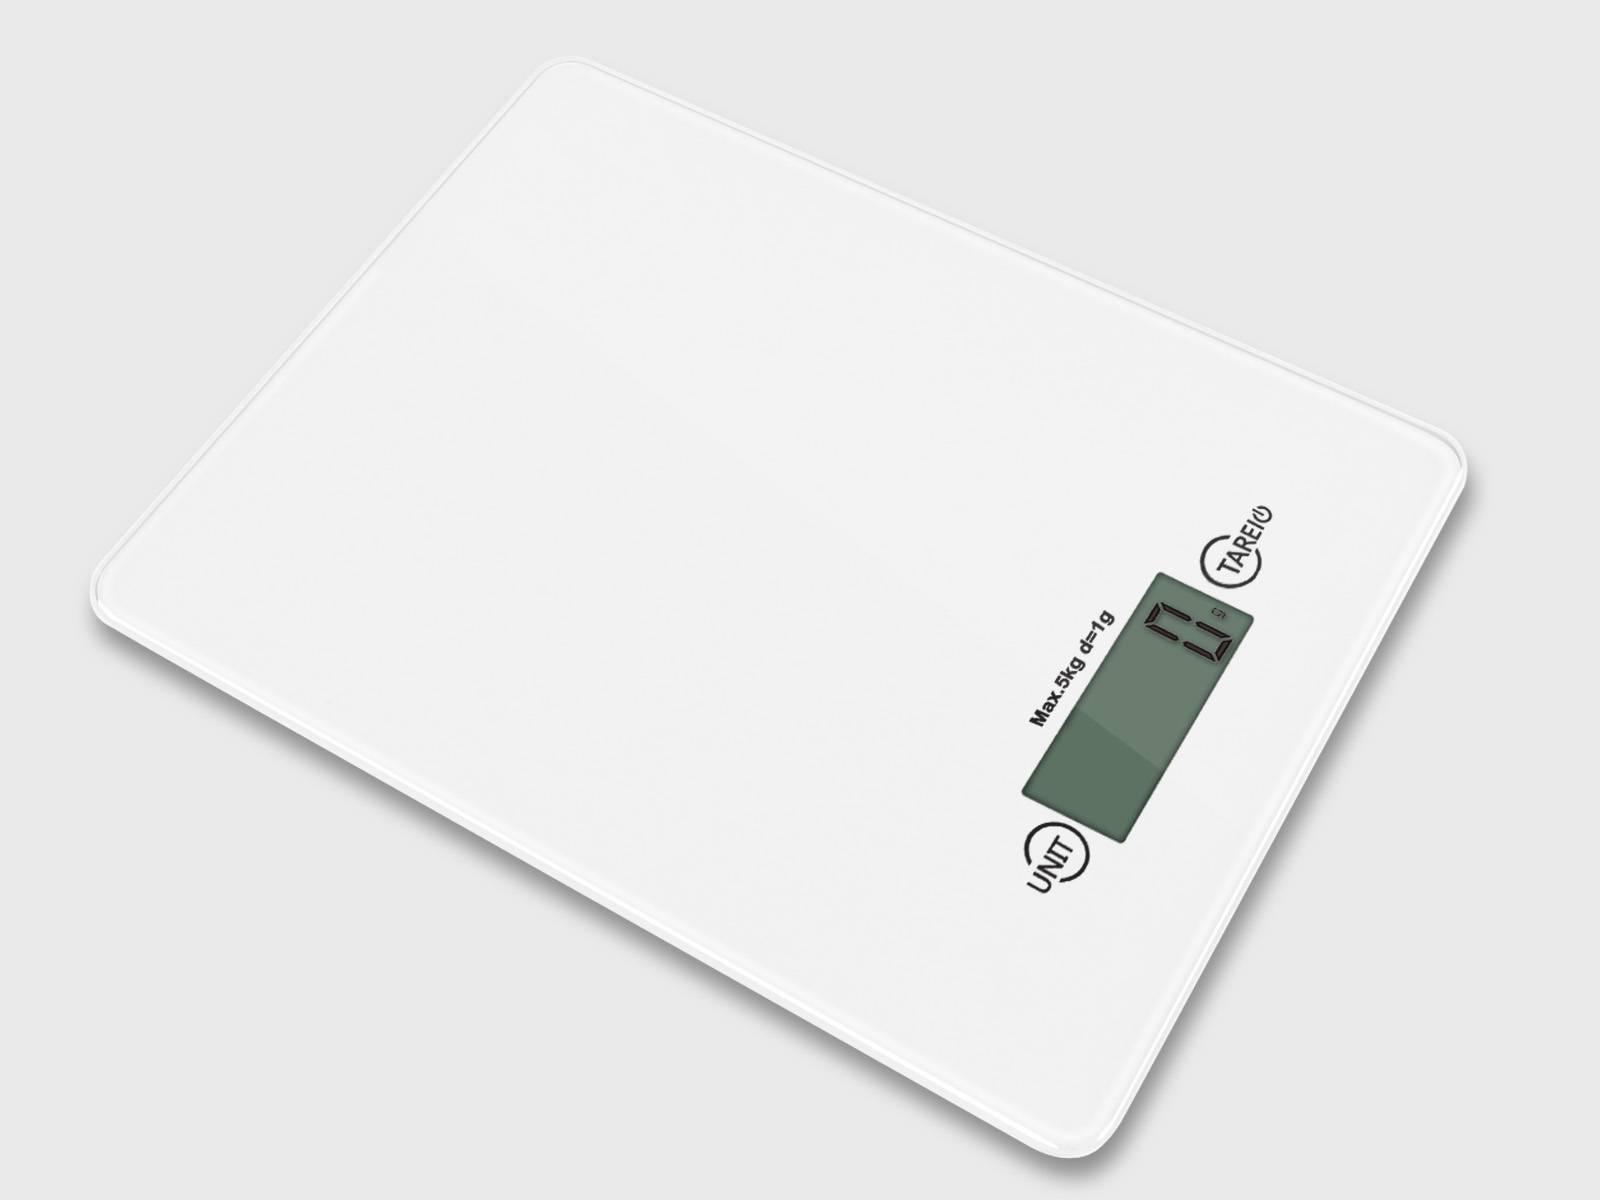 5kg electronic kitchen scale VKS314